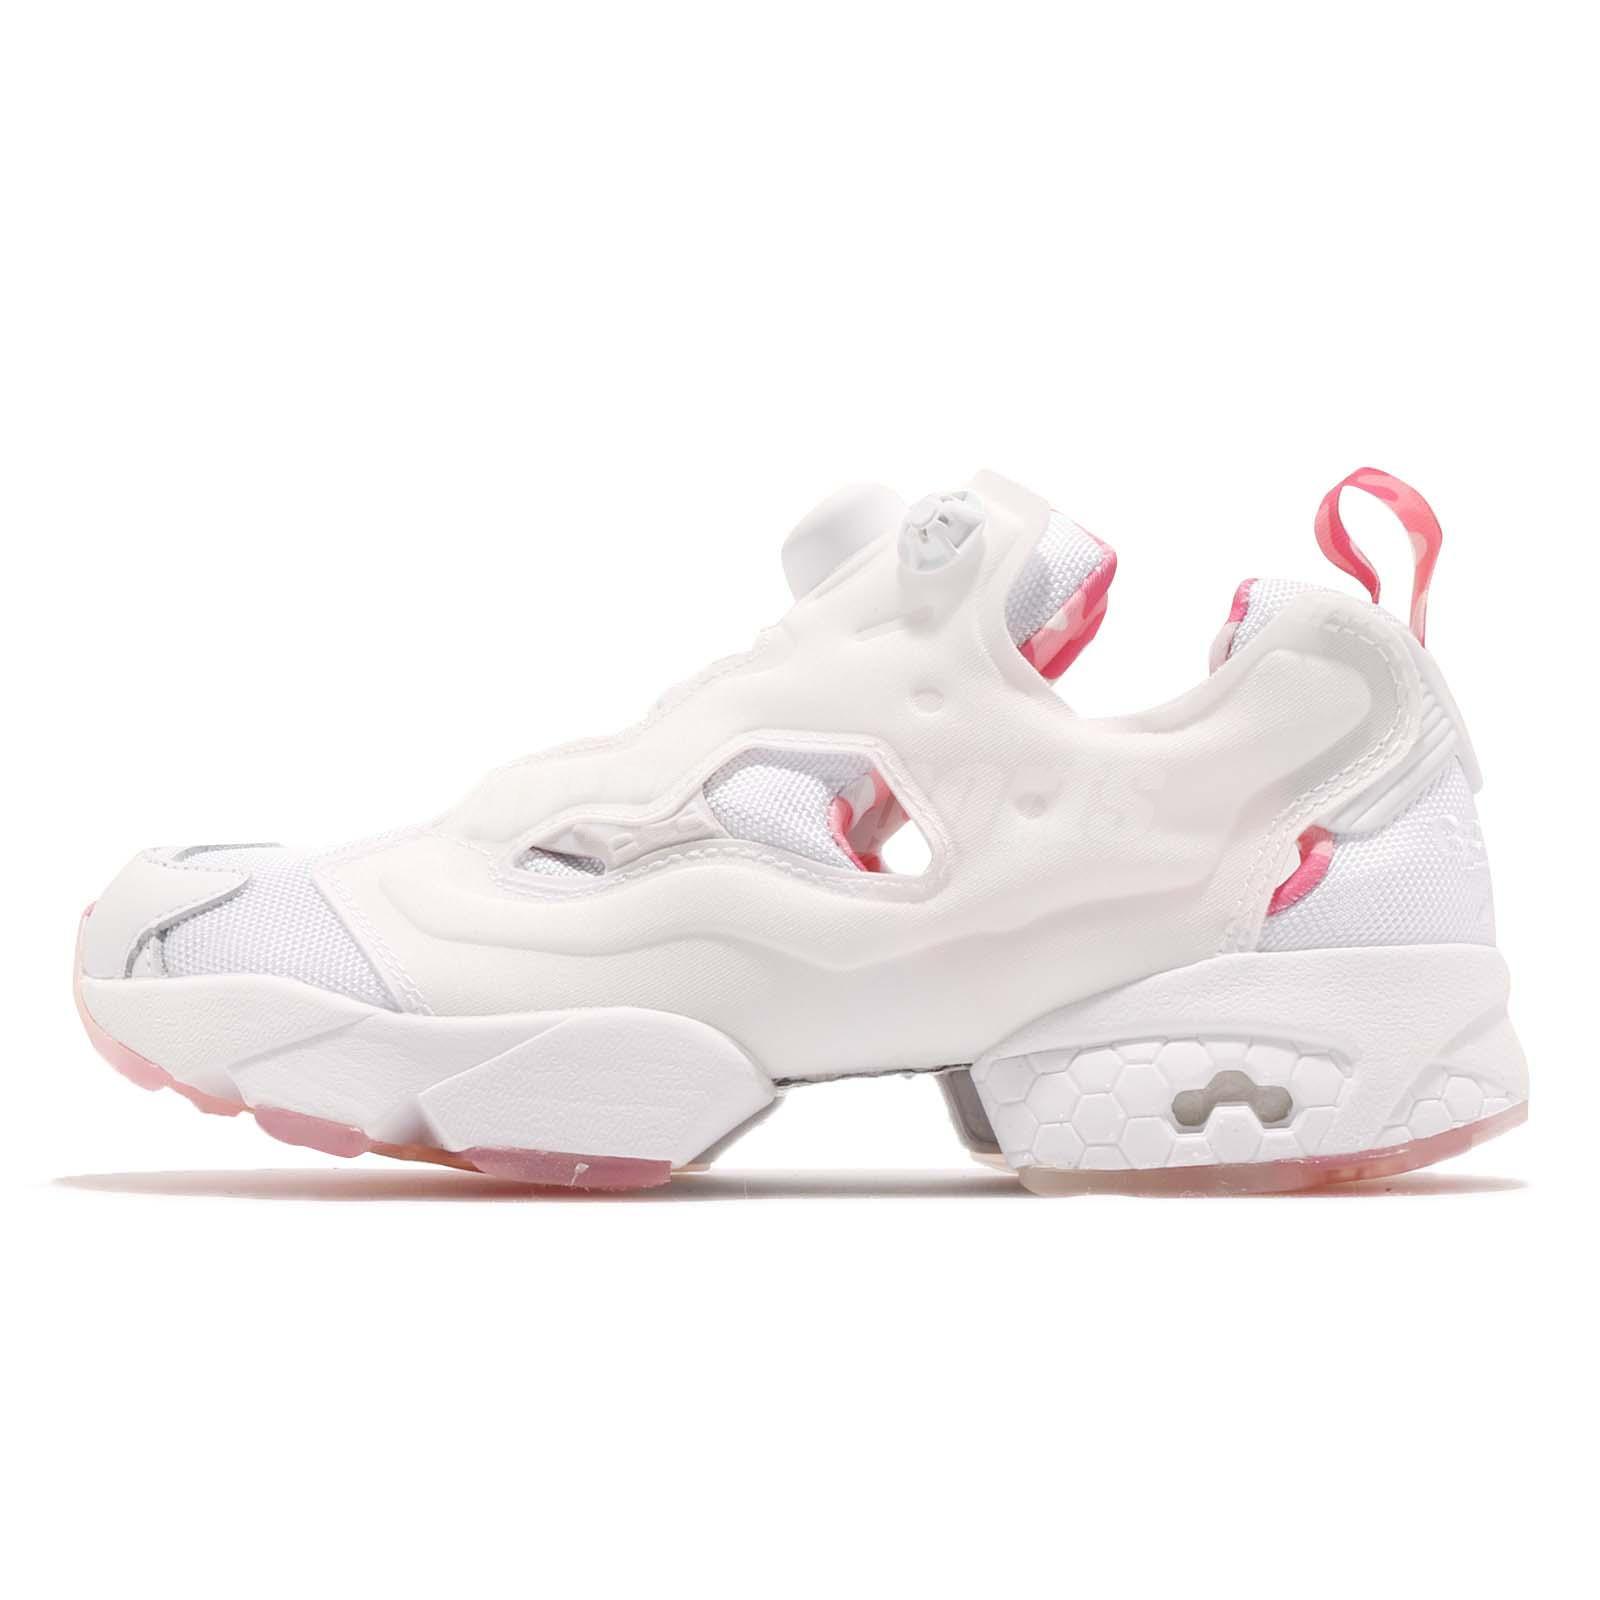 Details about Reebok Instapump Fury OG MU White Pink Men Women Casual Shoes Sneakers DV3696